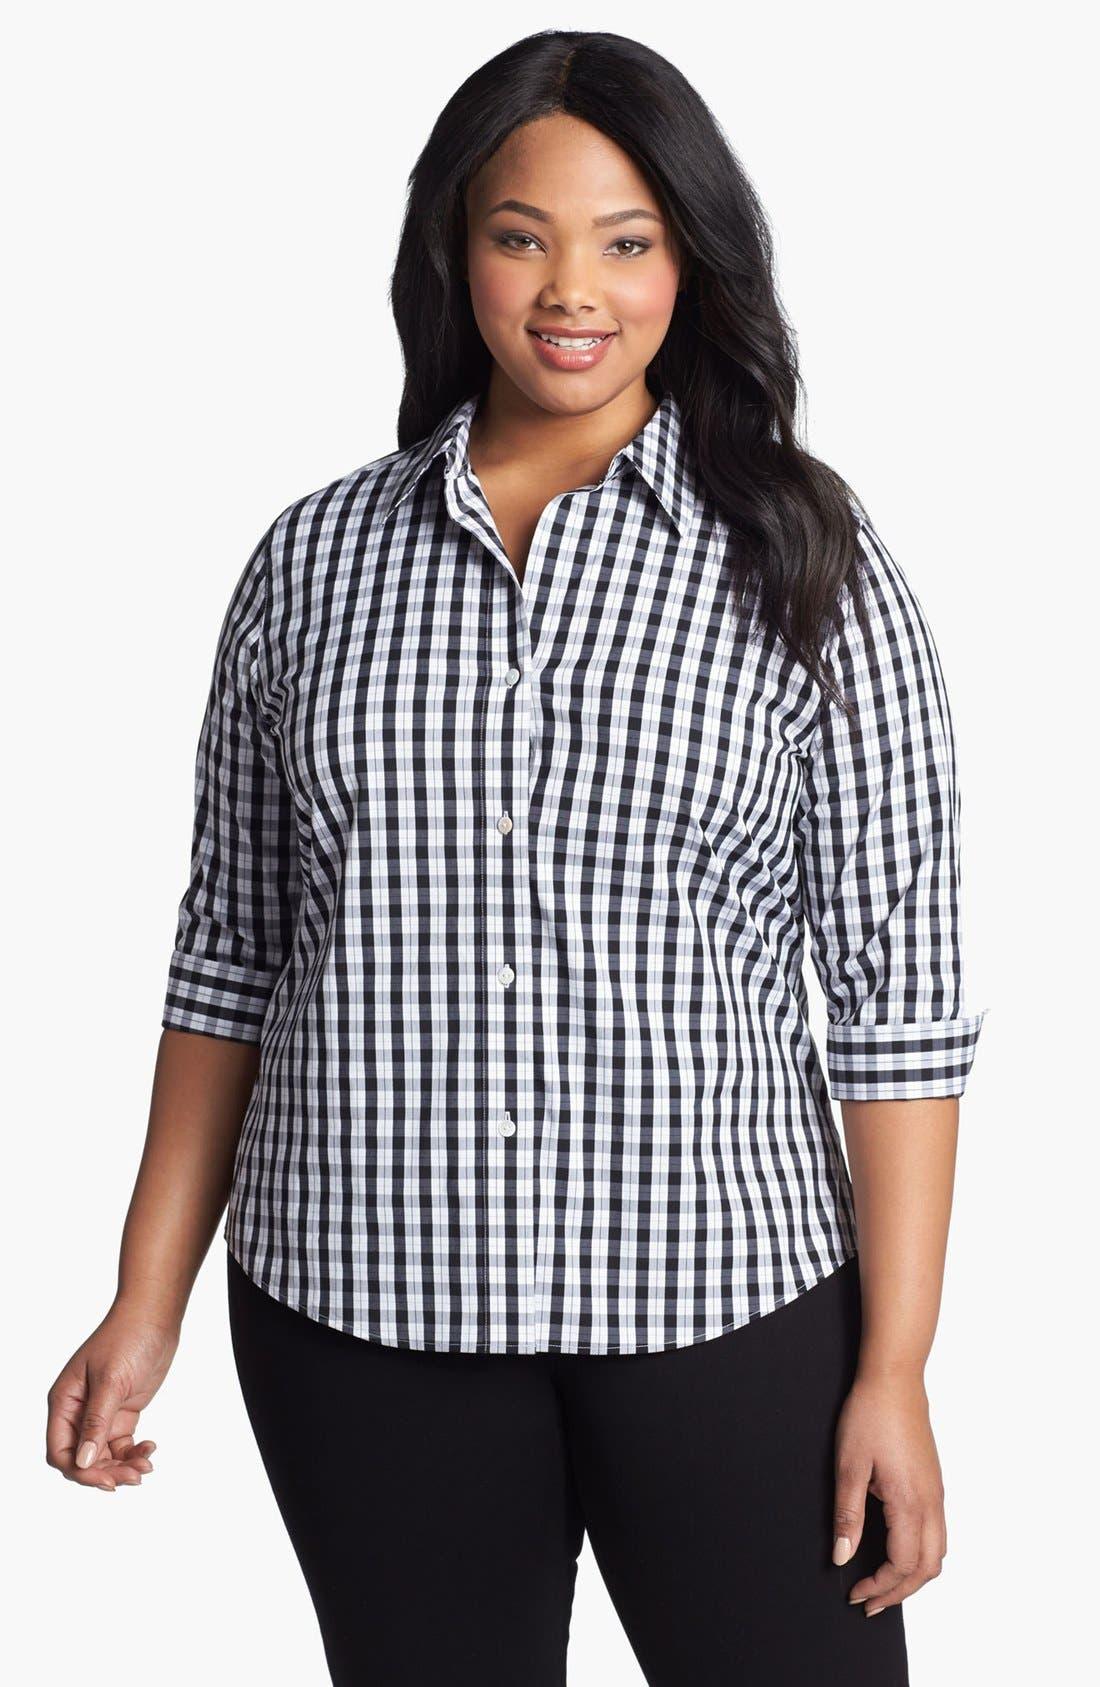 Alternate Image 1 Selected - Foxcroft Print Shaped Shirt (Plus Size)